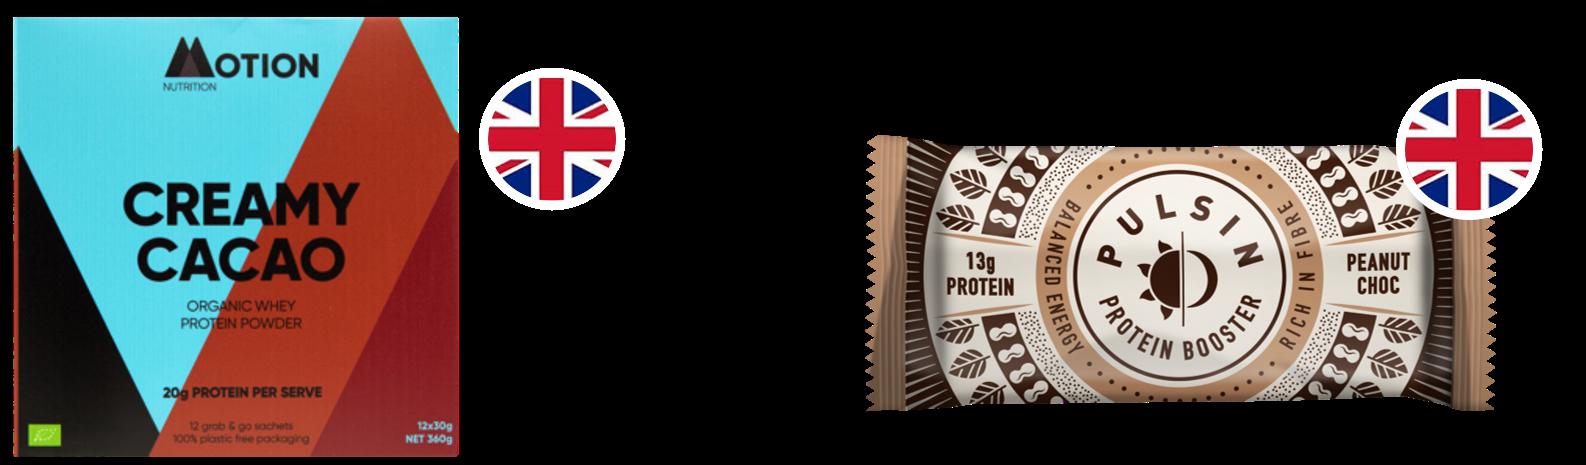 barres protéinées Motion nutrition & Pulsin